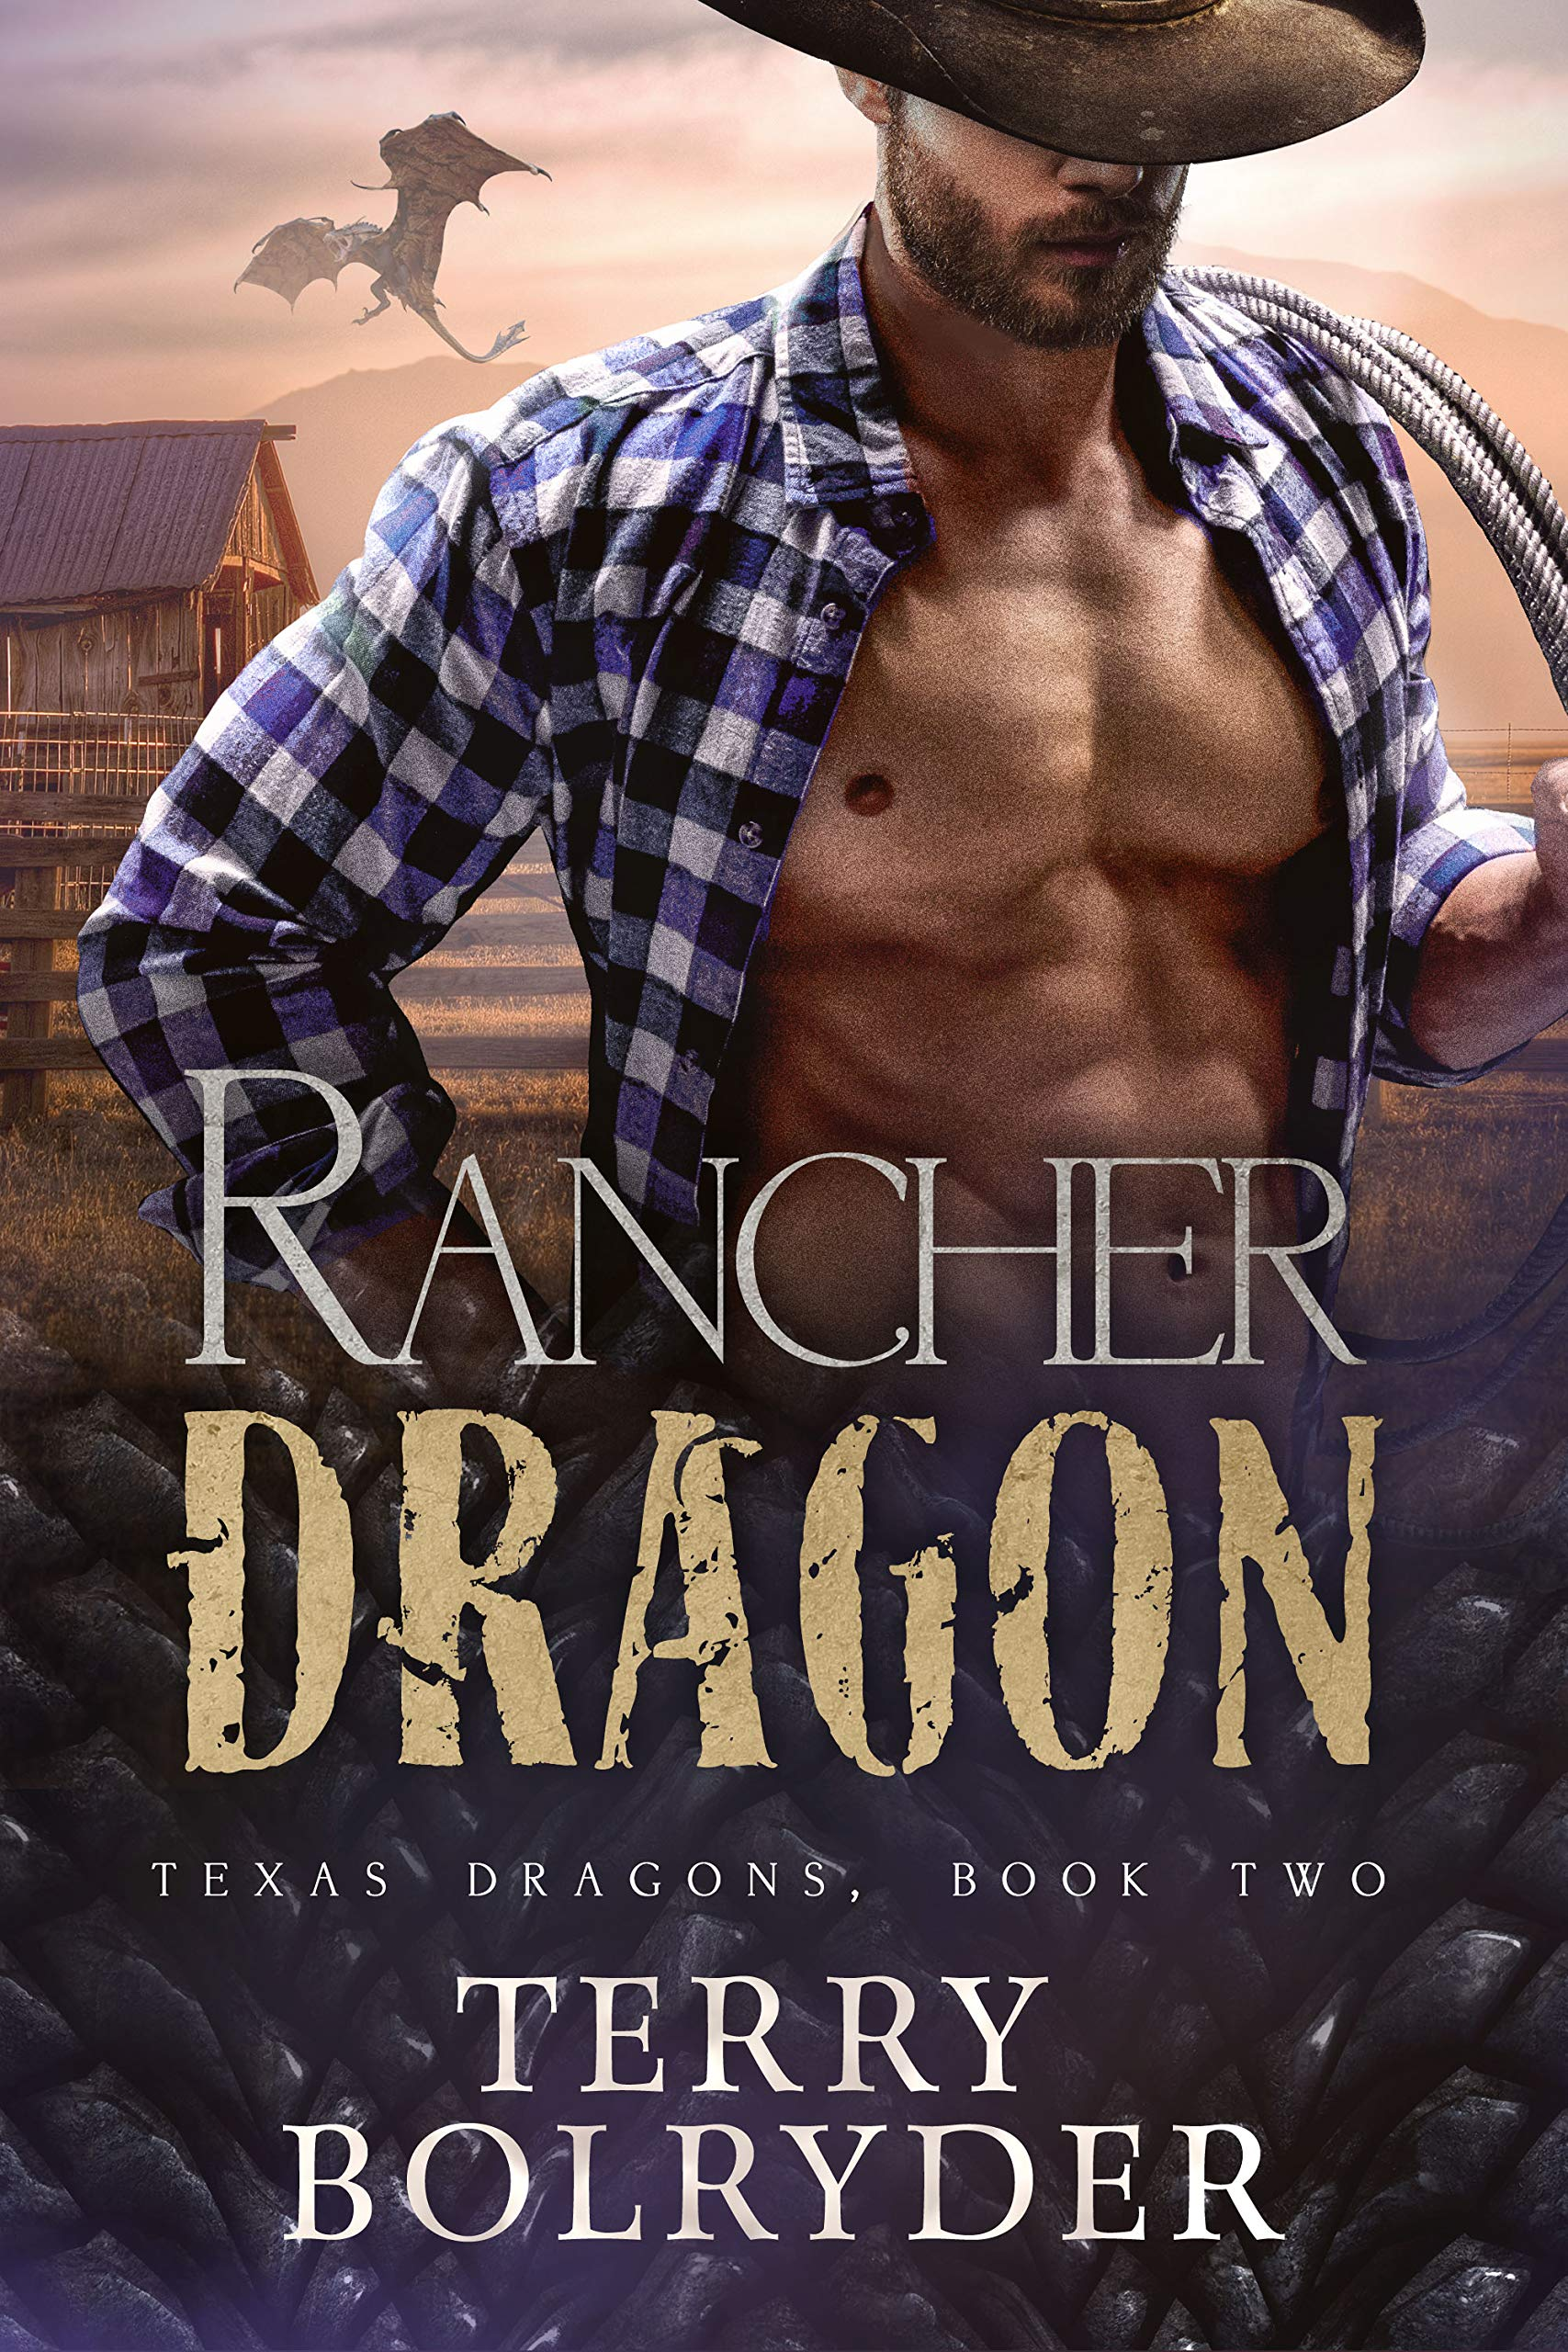 Rancher Dragon (Texas Dragons #2)